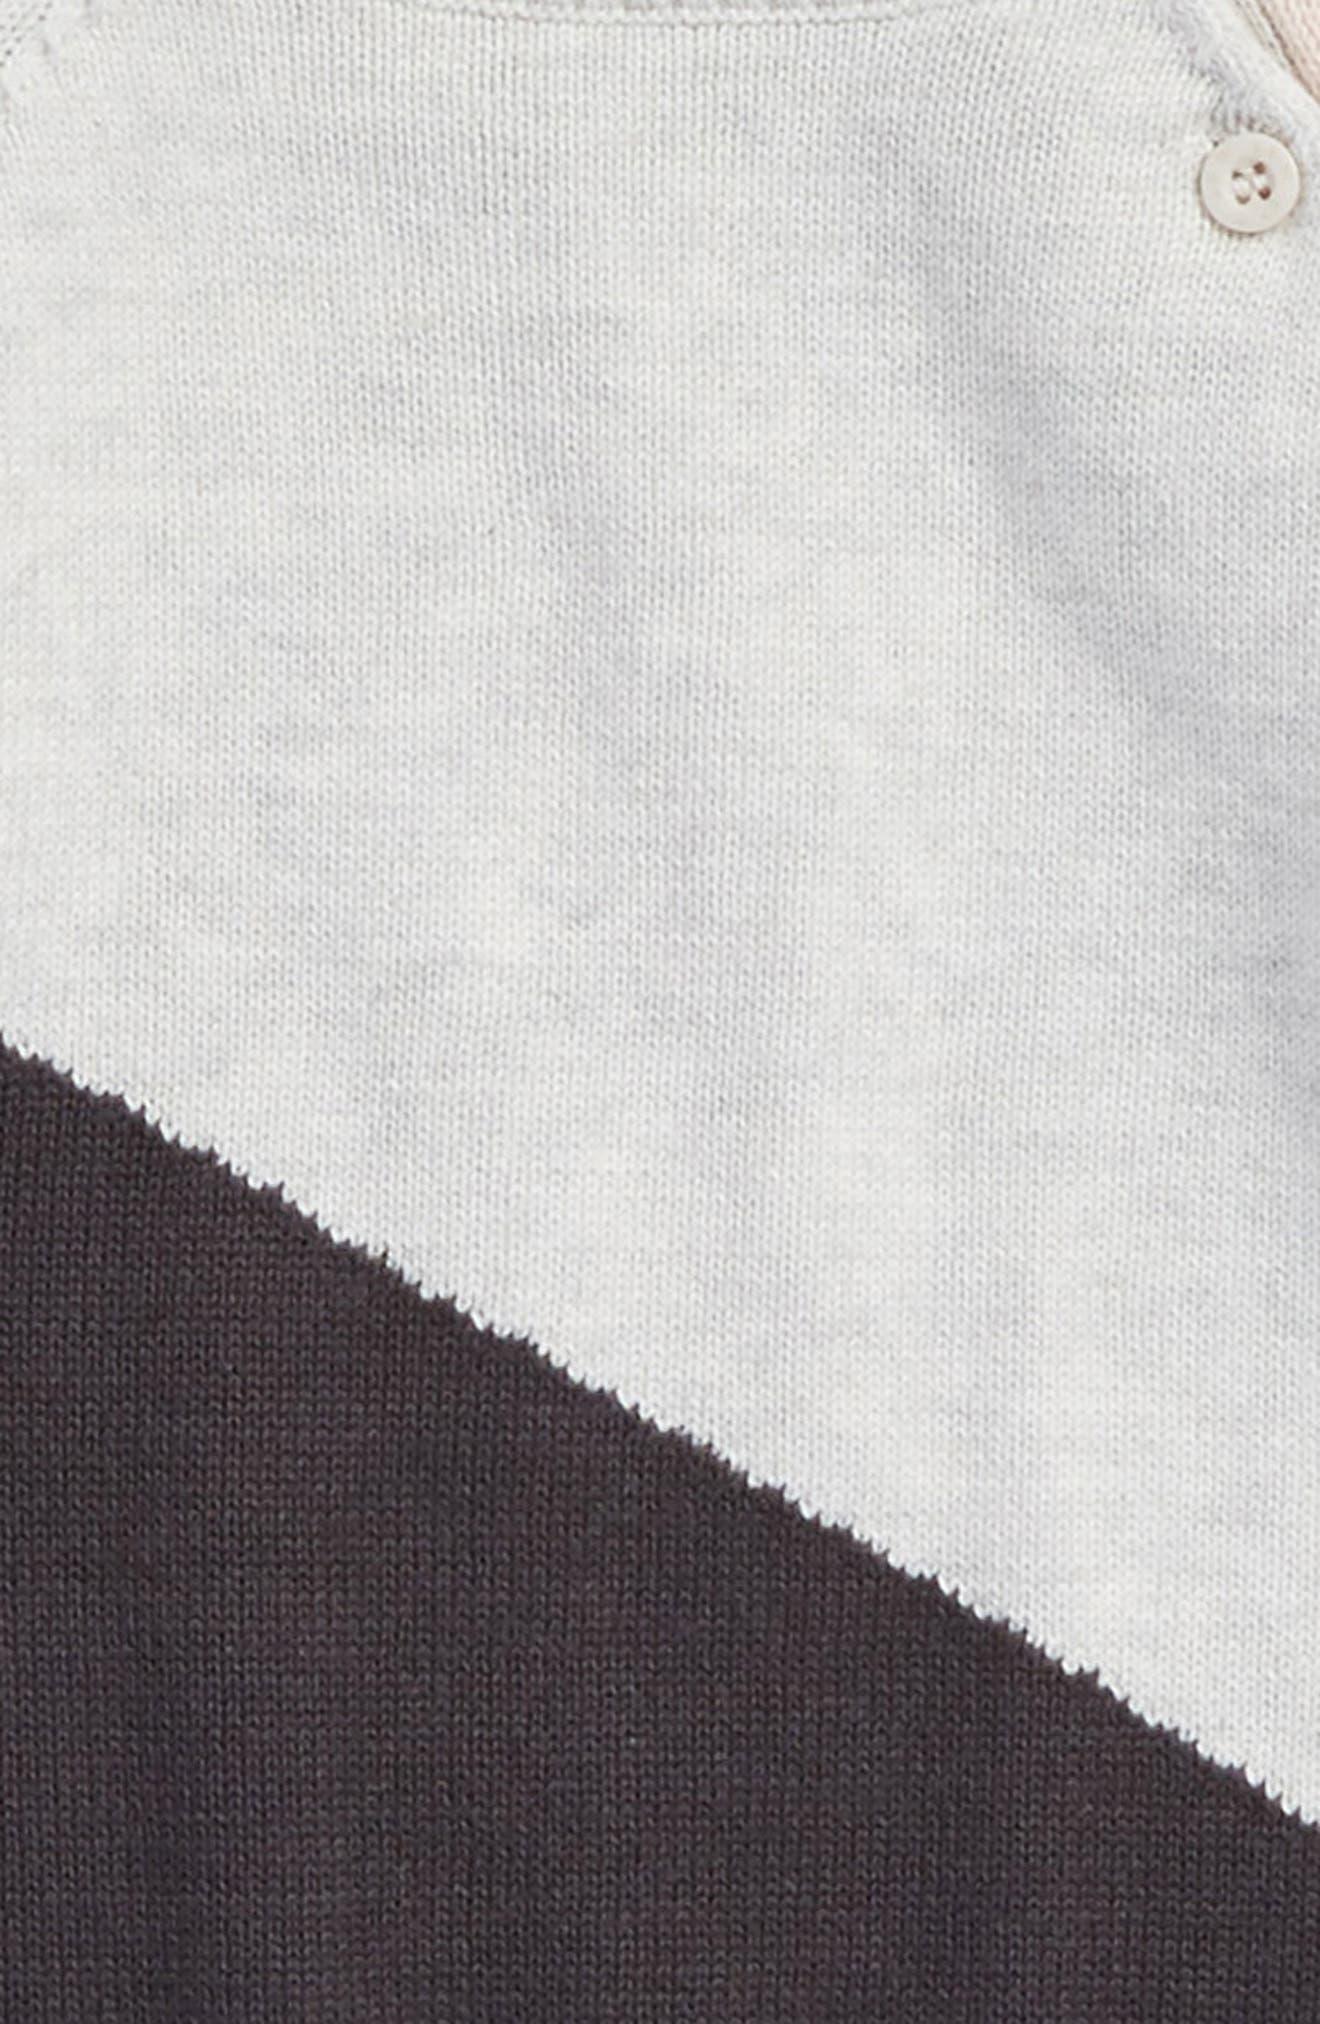 Alternate Image 2  - Miles Baby Knit Sweater Dress (Baby Girls)